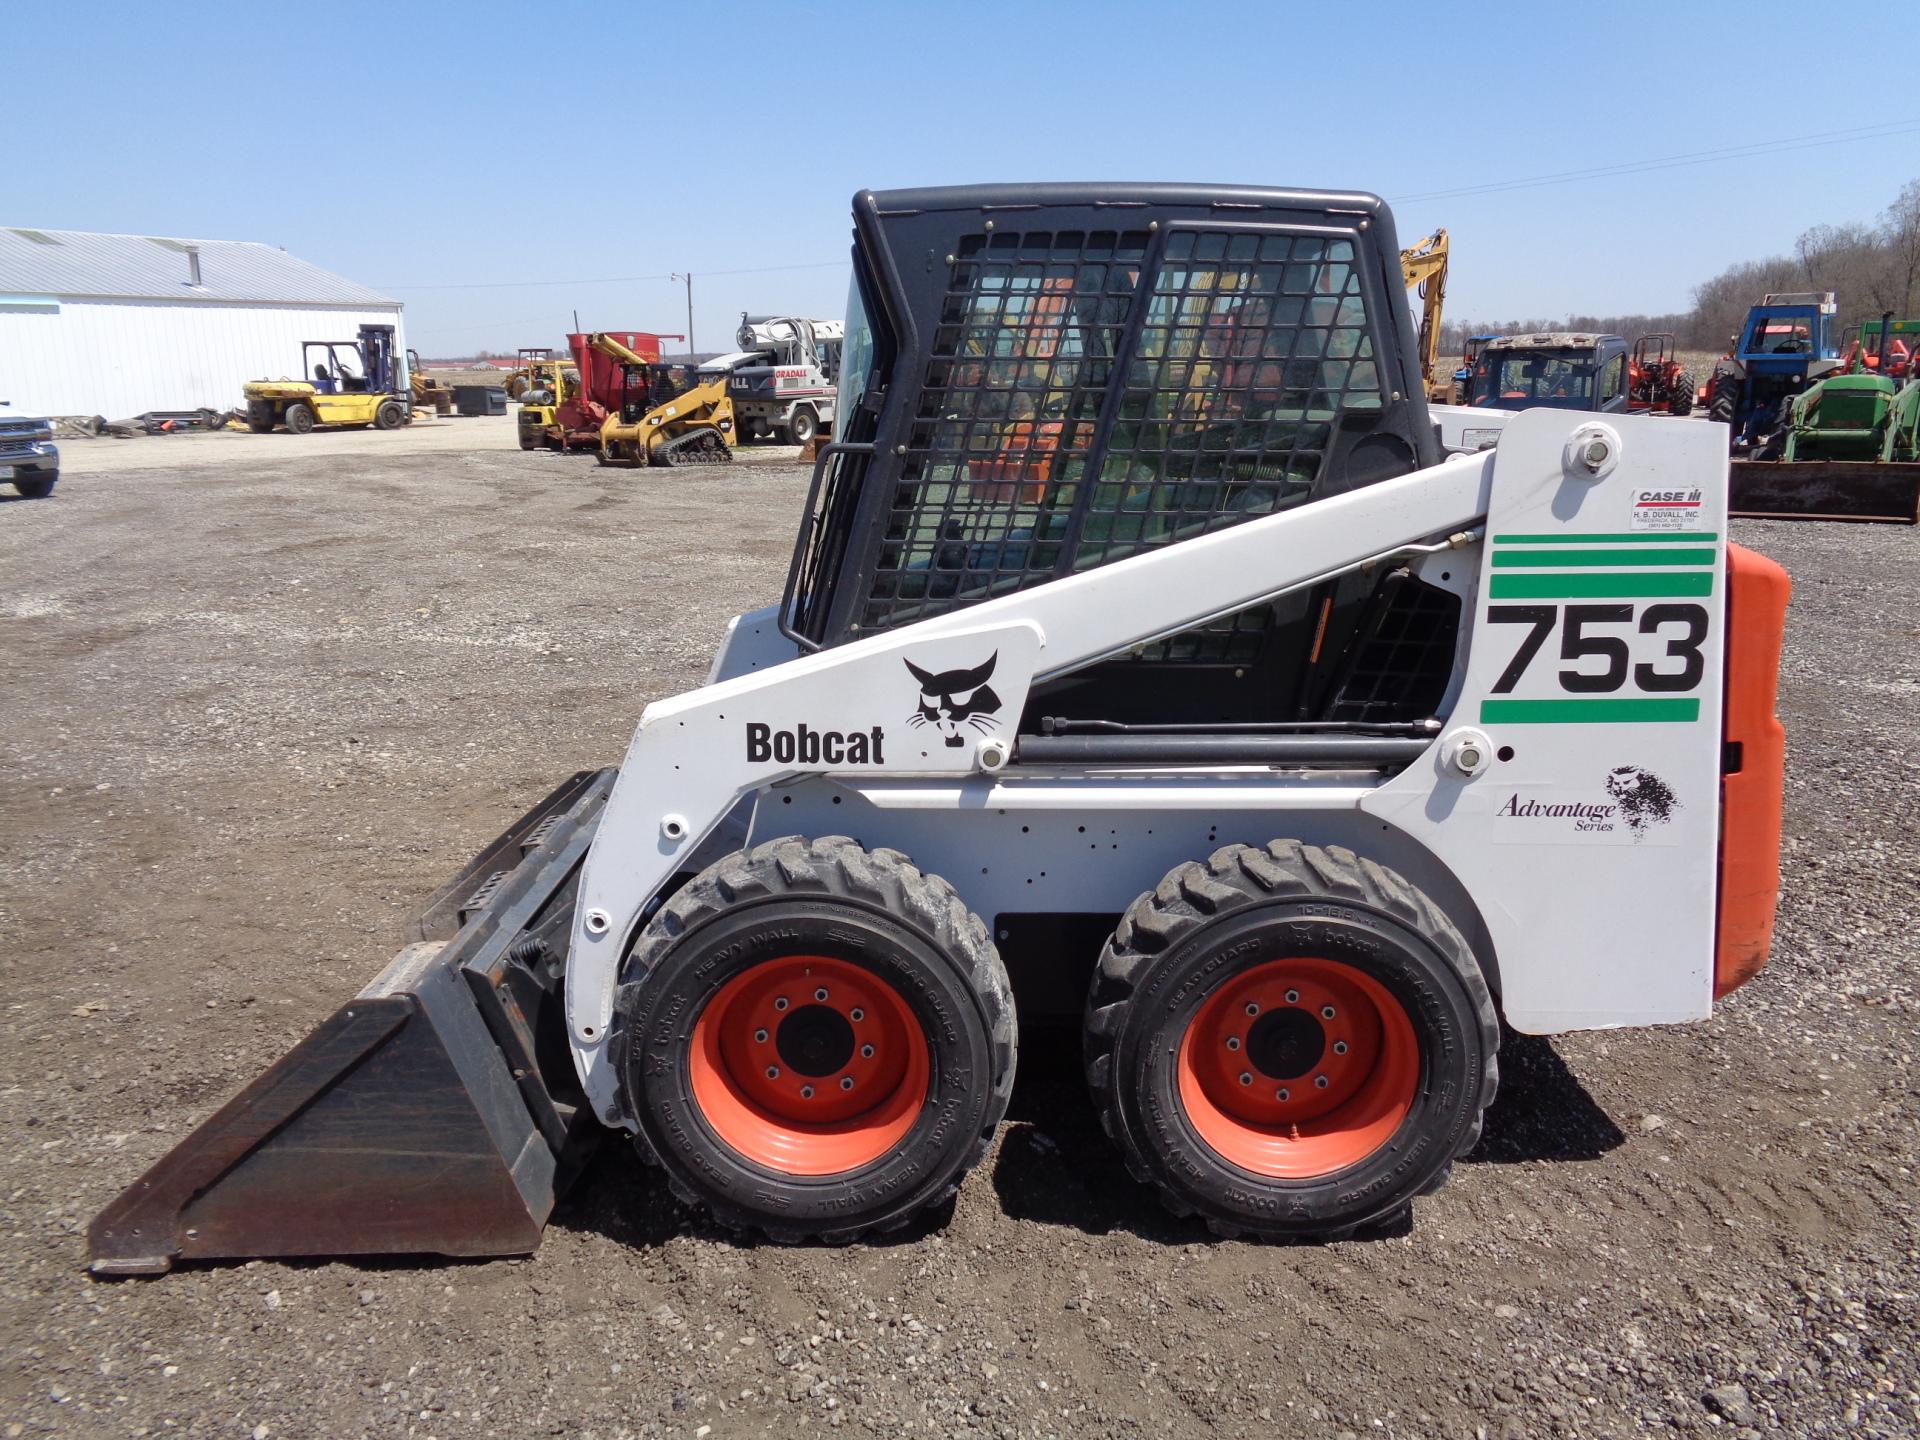 2000 Bobcat 753     $23,900